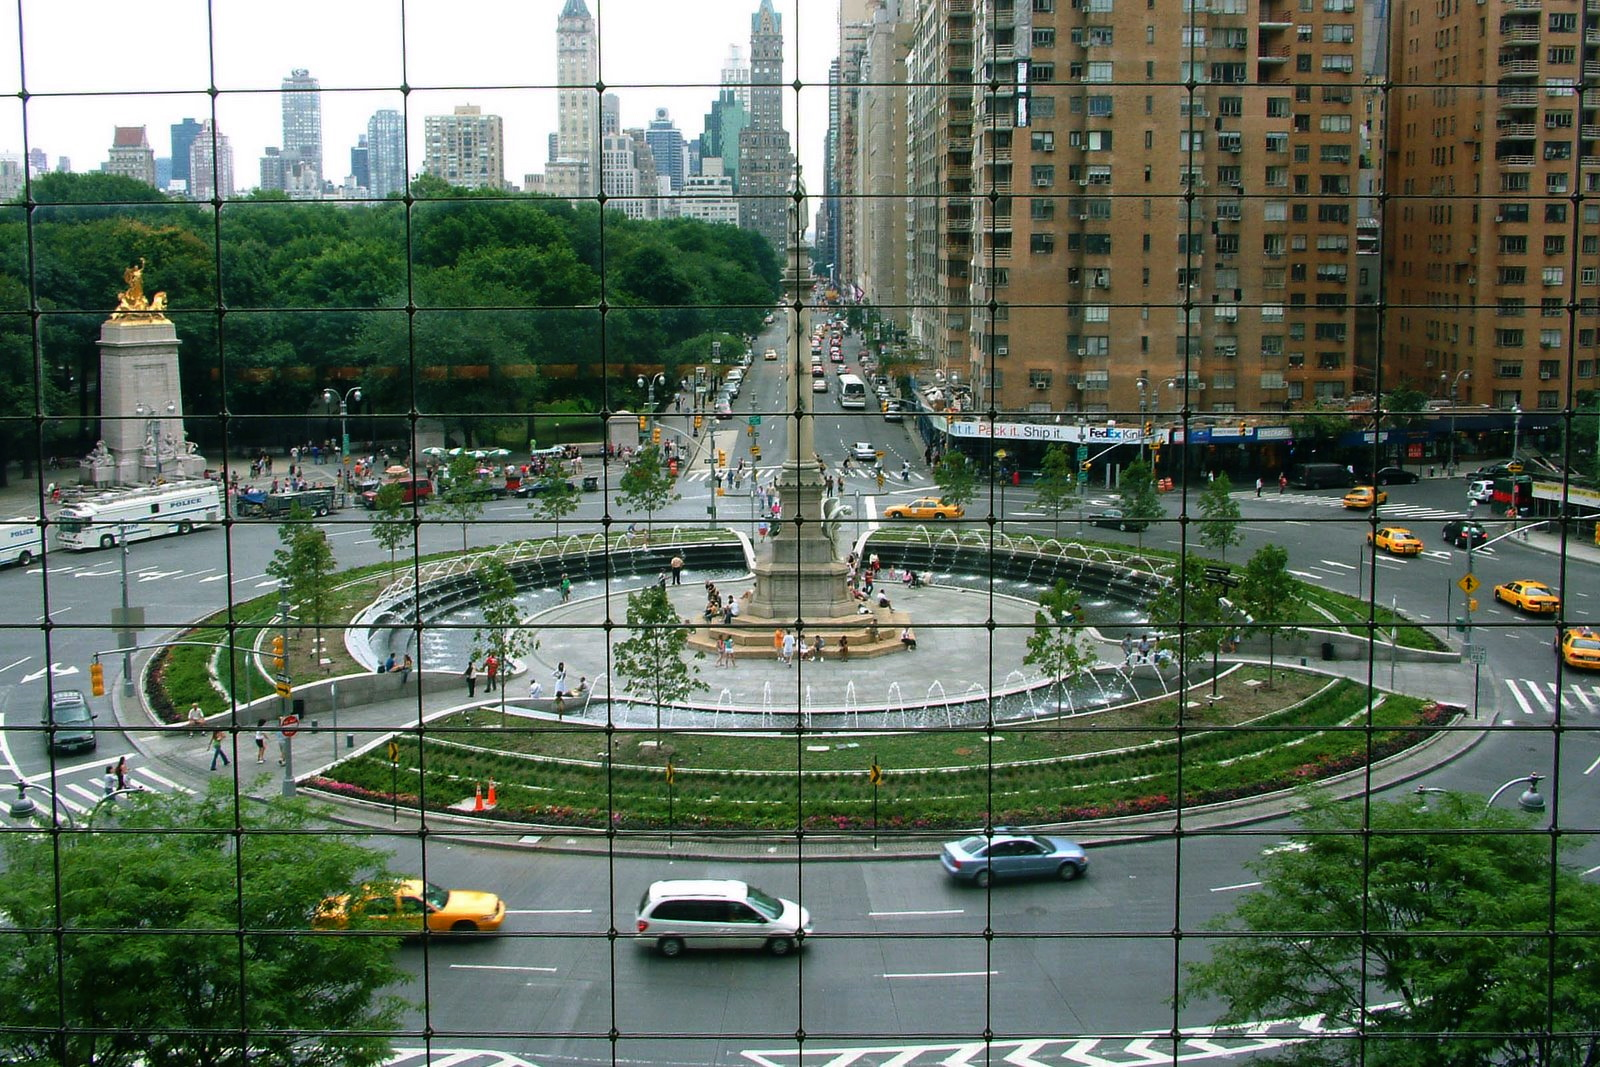 central.park.jpg